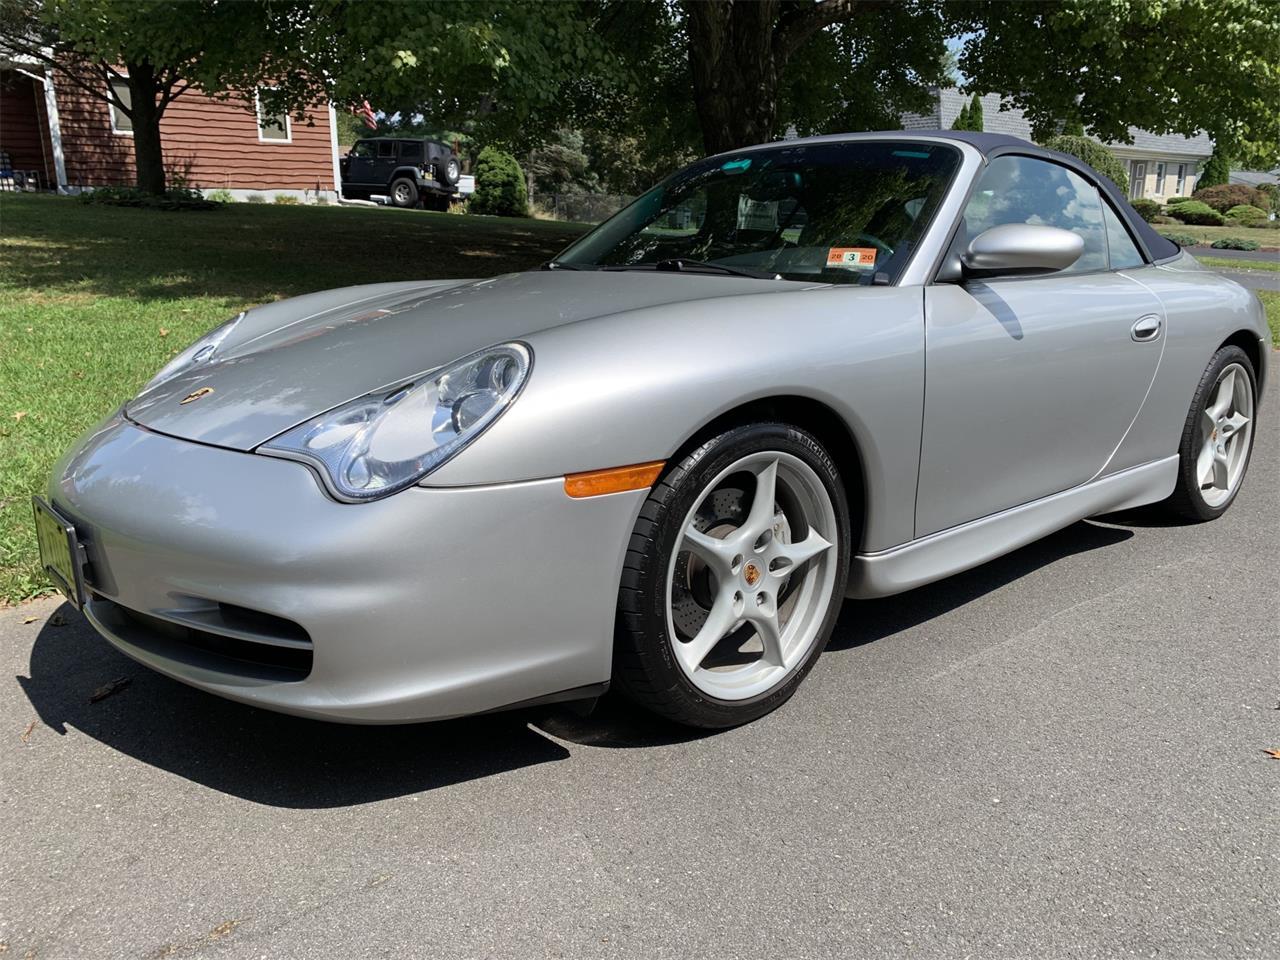 2003 Porsche 911 Carrera 4 Cabriolet For Sale Classiccars